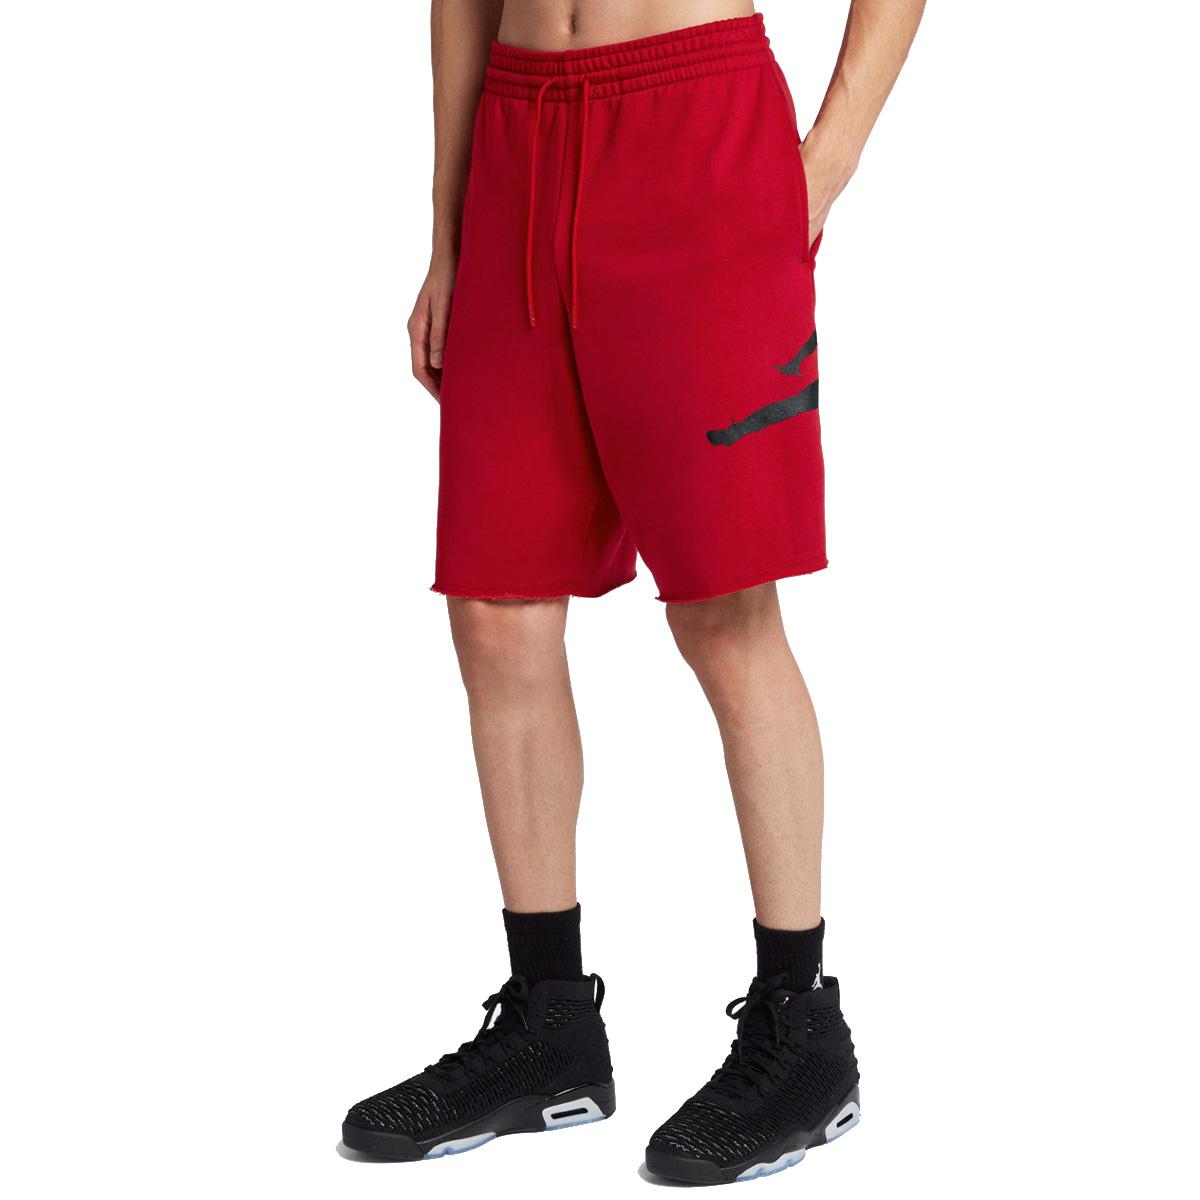 0808e527a93 ... NIKE JORDAN SPORTSWEAR JUMPMAN AIR FLEECE SHORTS Nike Jordan sportswear  jump man air fleece shorts RED ...